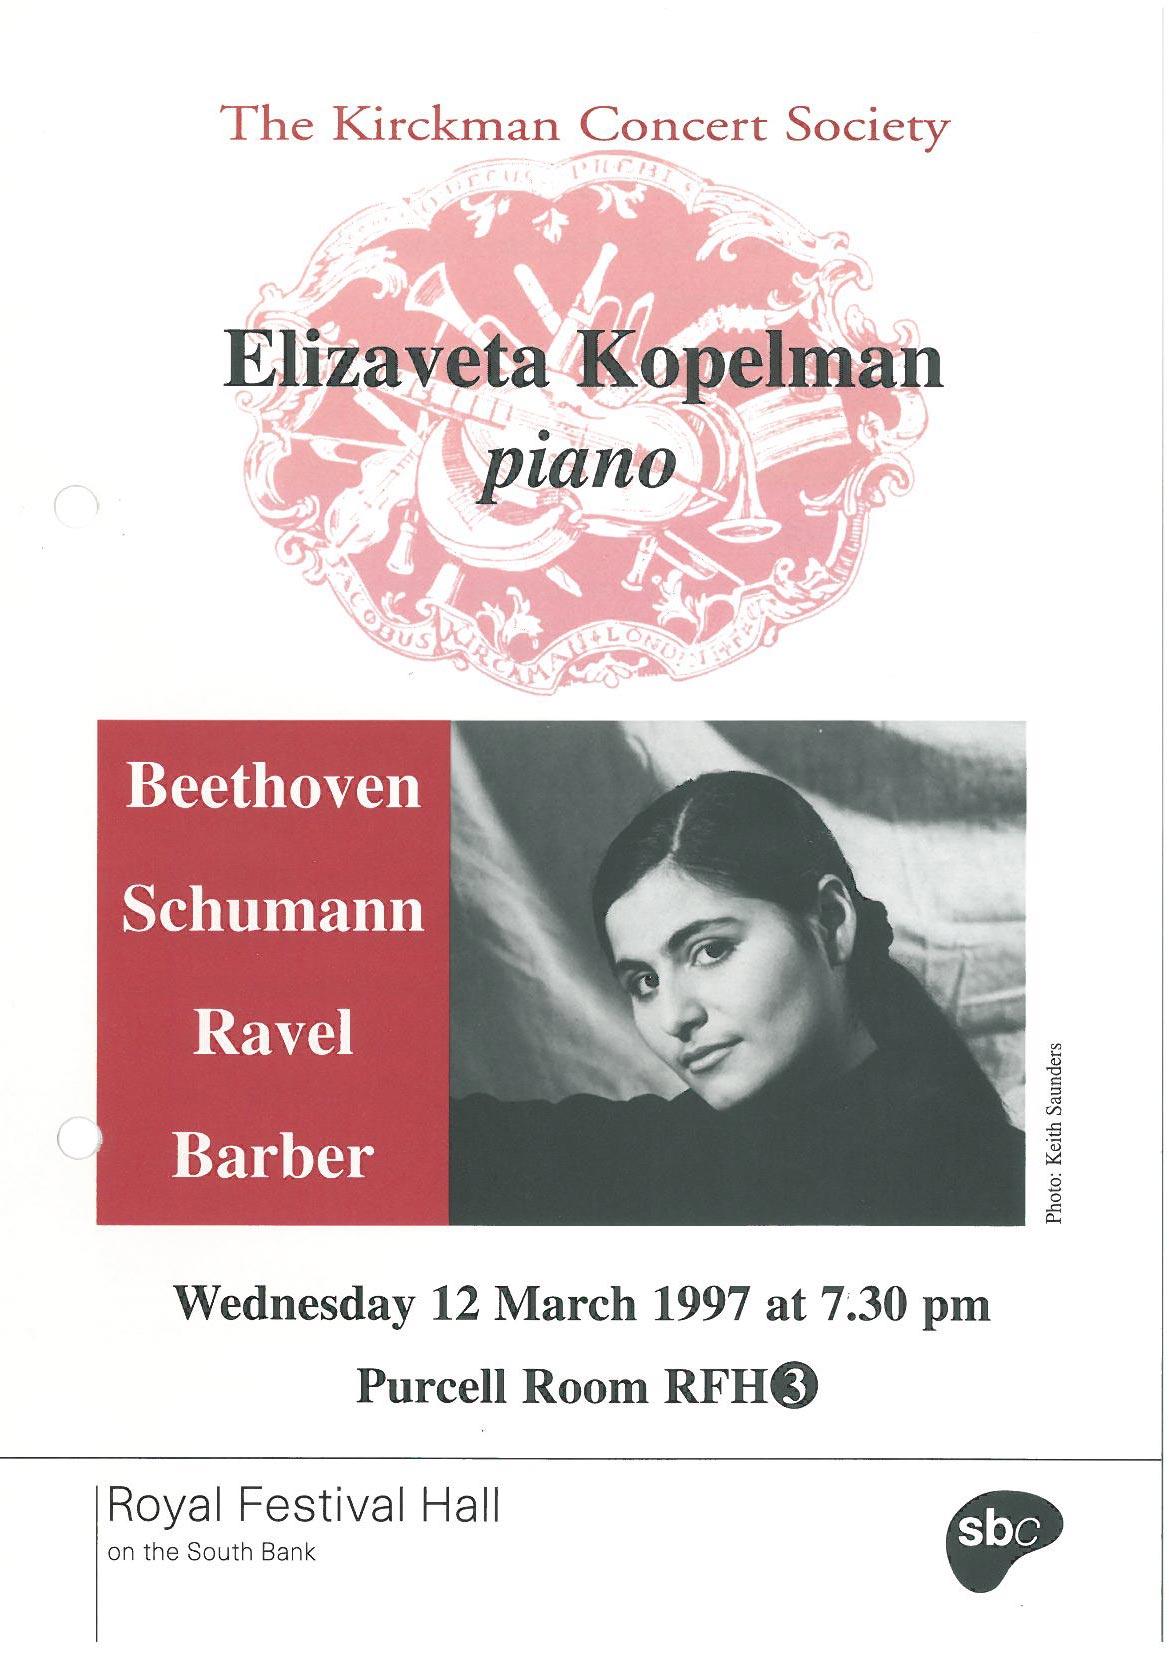 Programme,-1997,-Kirckman-Concert-Society